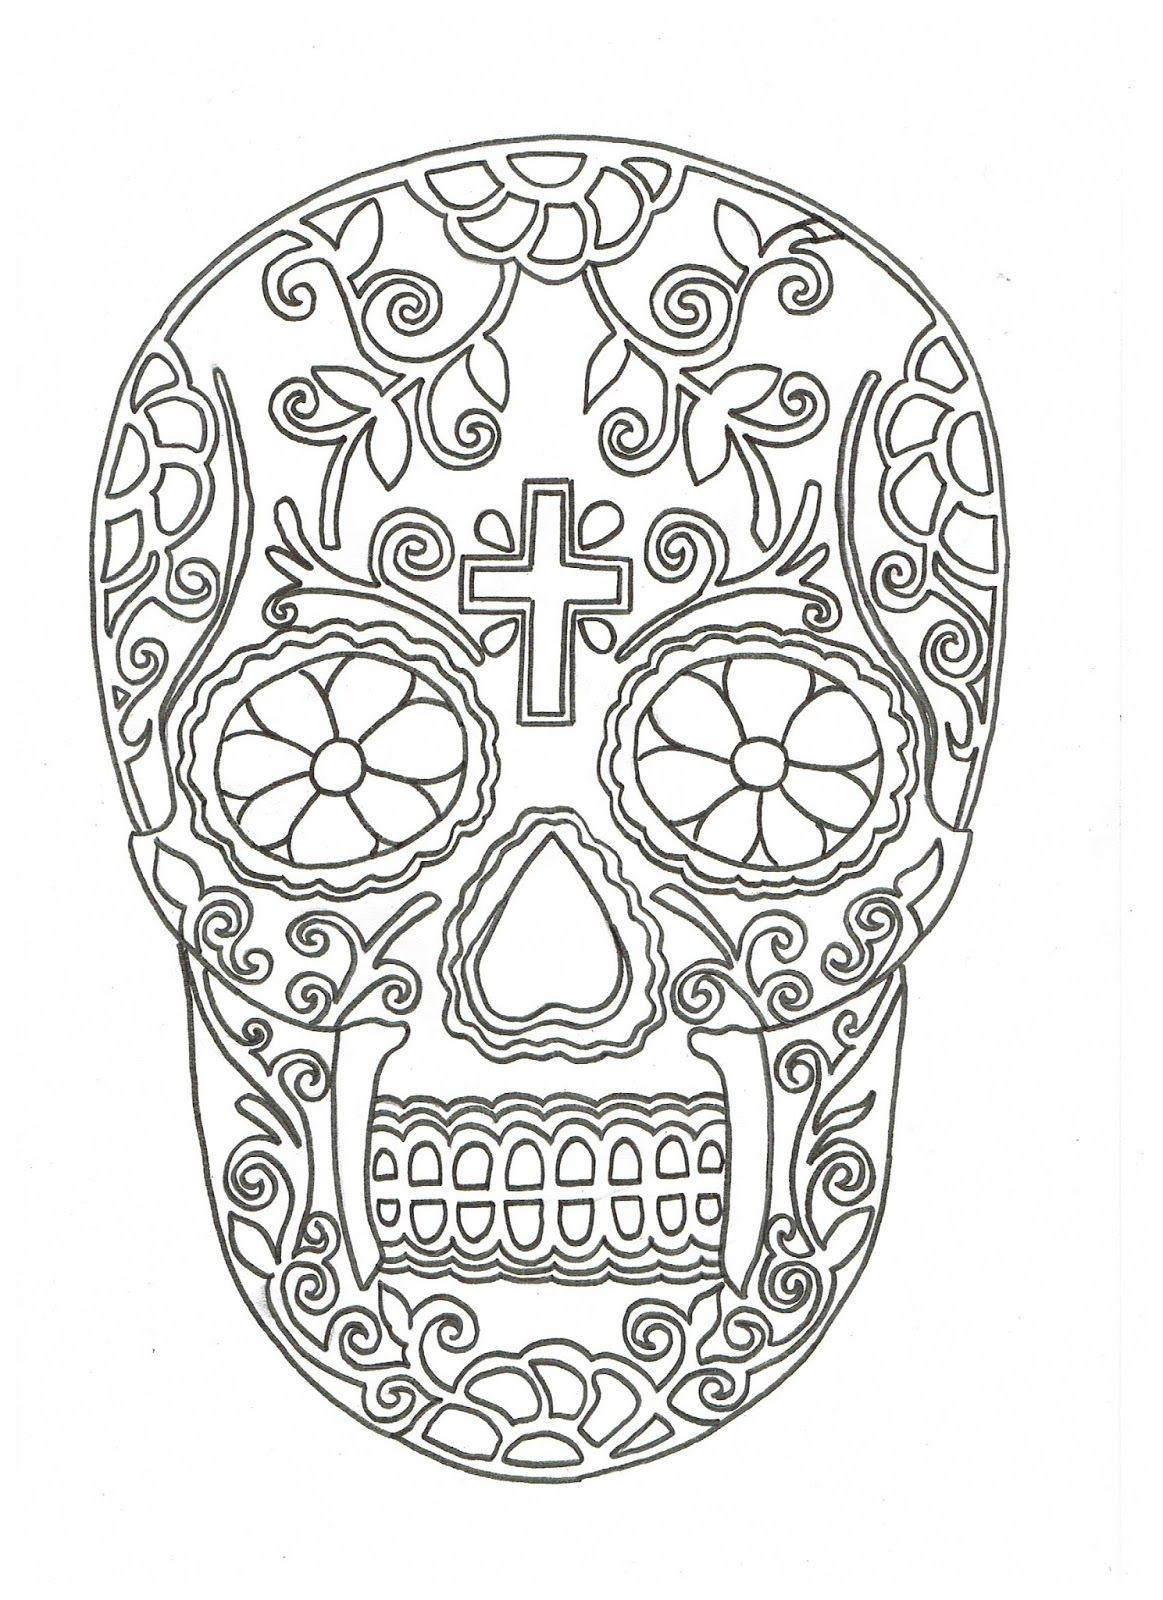 Calavera Skull Template | www.pixshark.com - Images ...